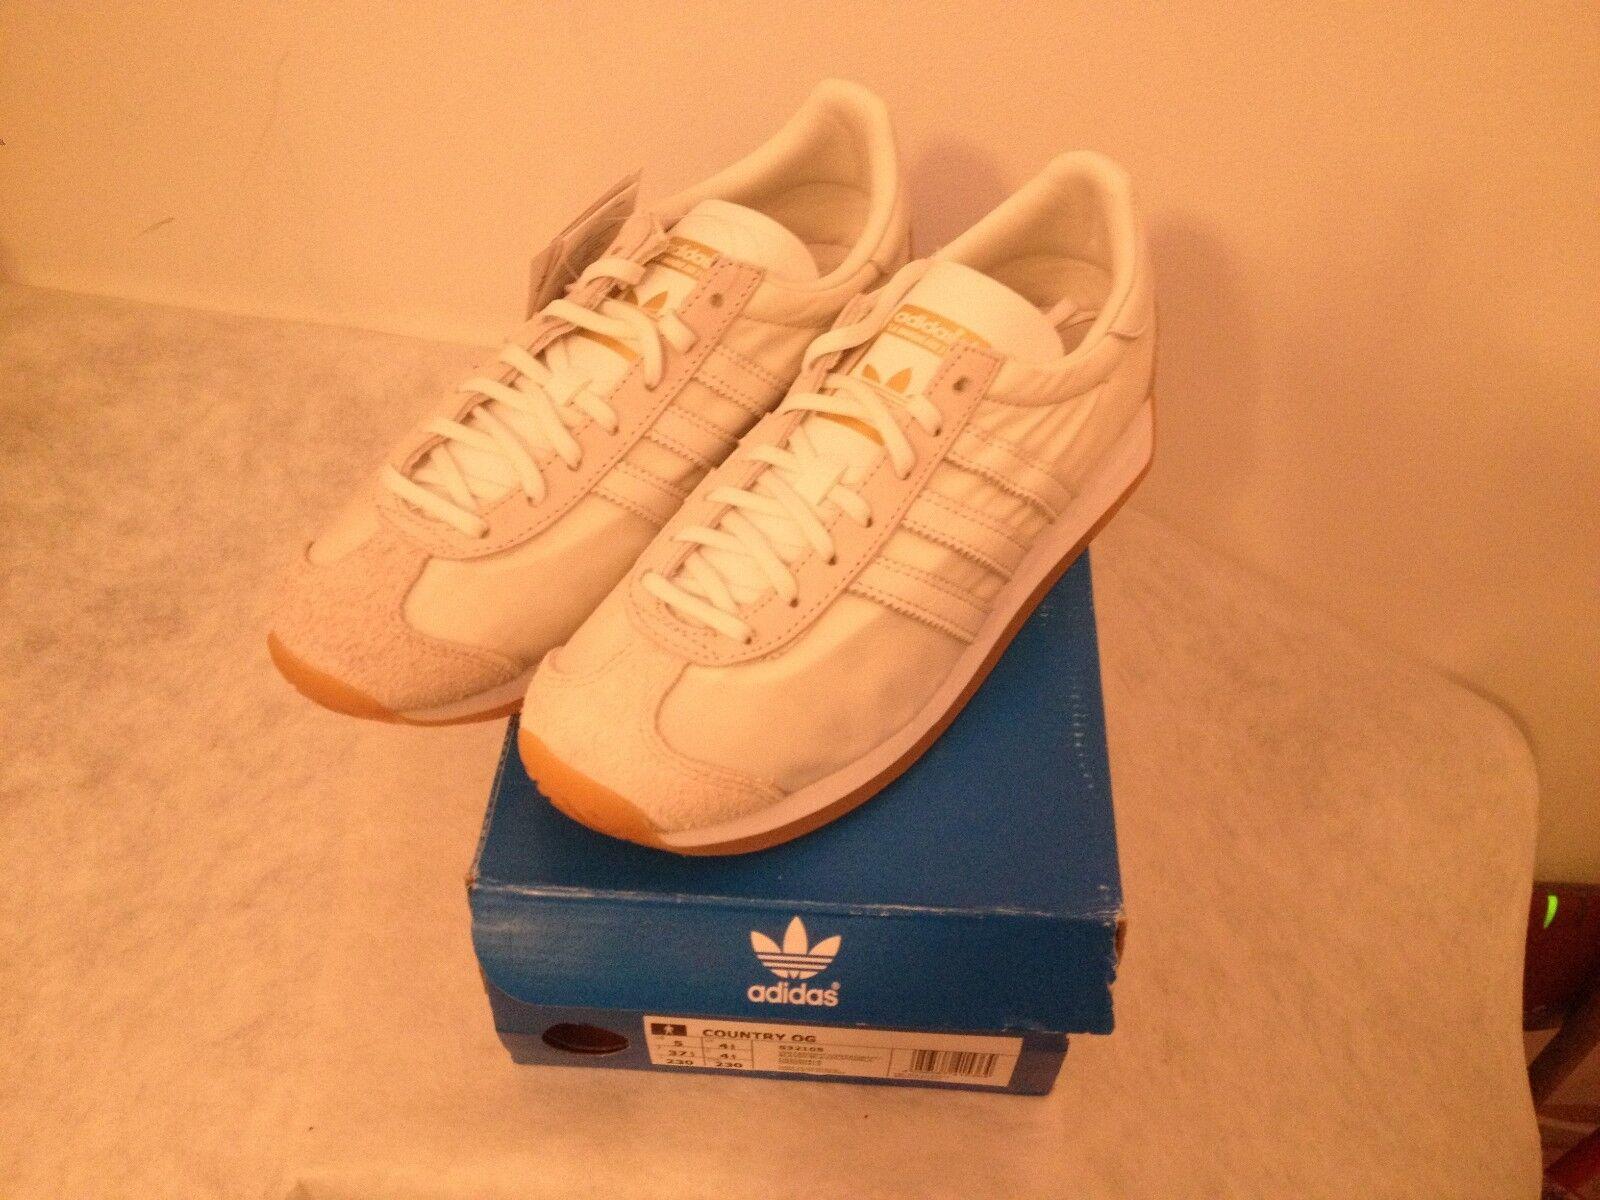 Adidas COUNTRY OG in 37 1 3 US 5 neu BNWT S32105 Retro Vintage